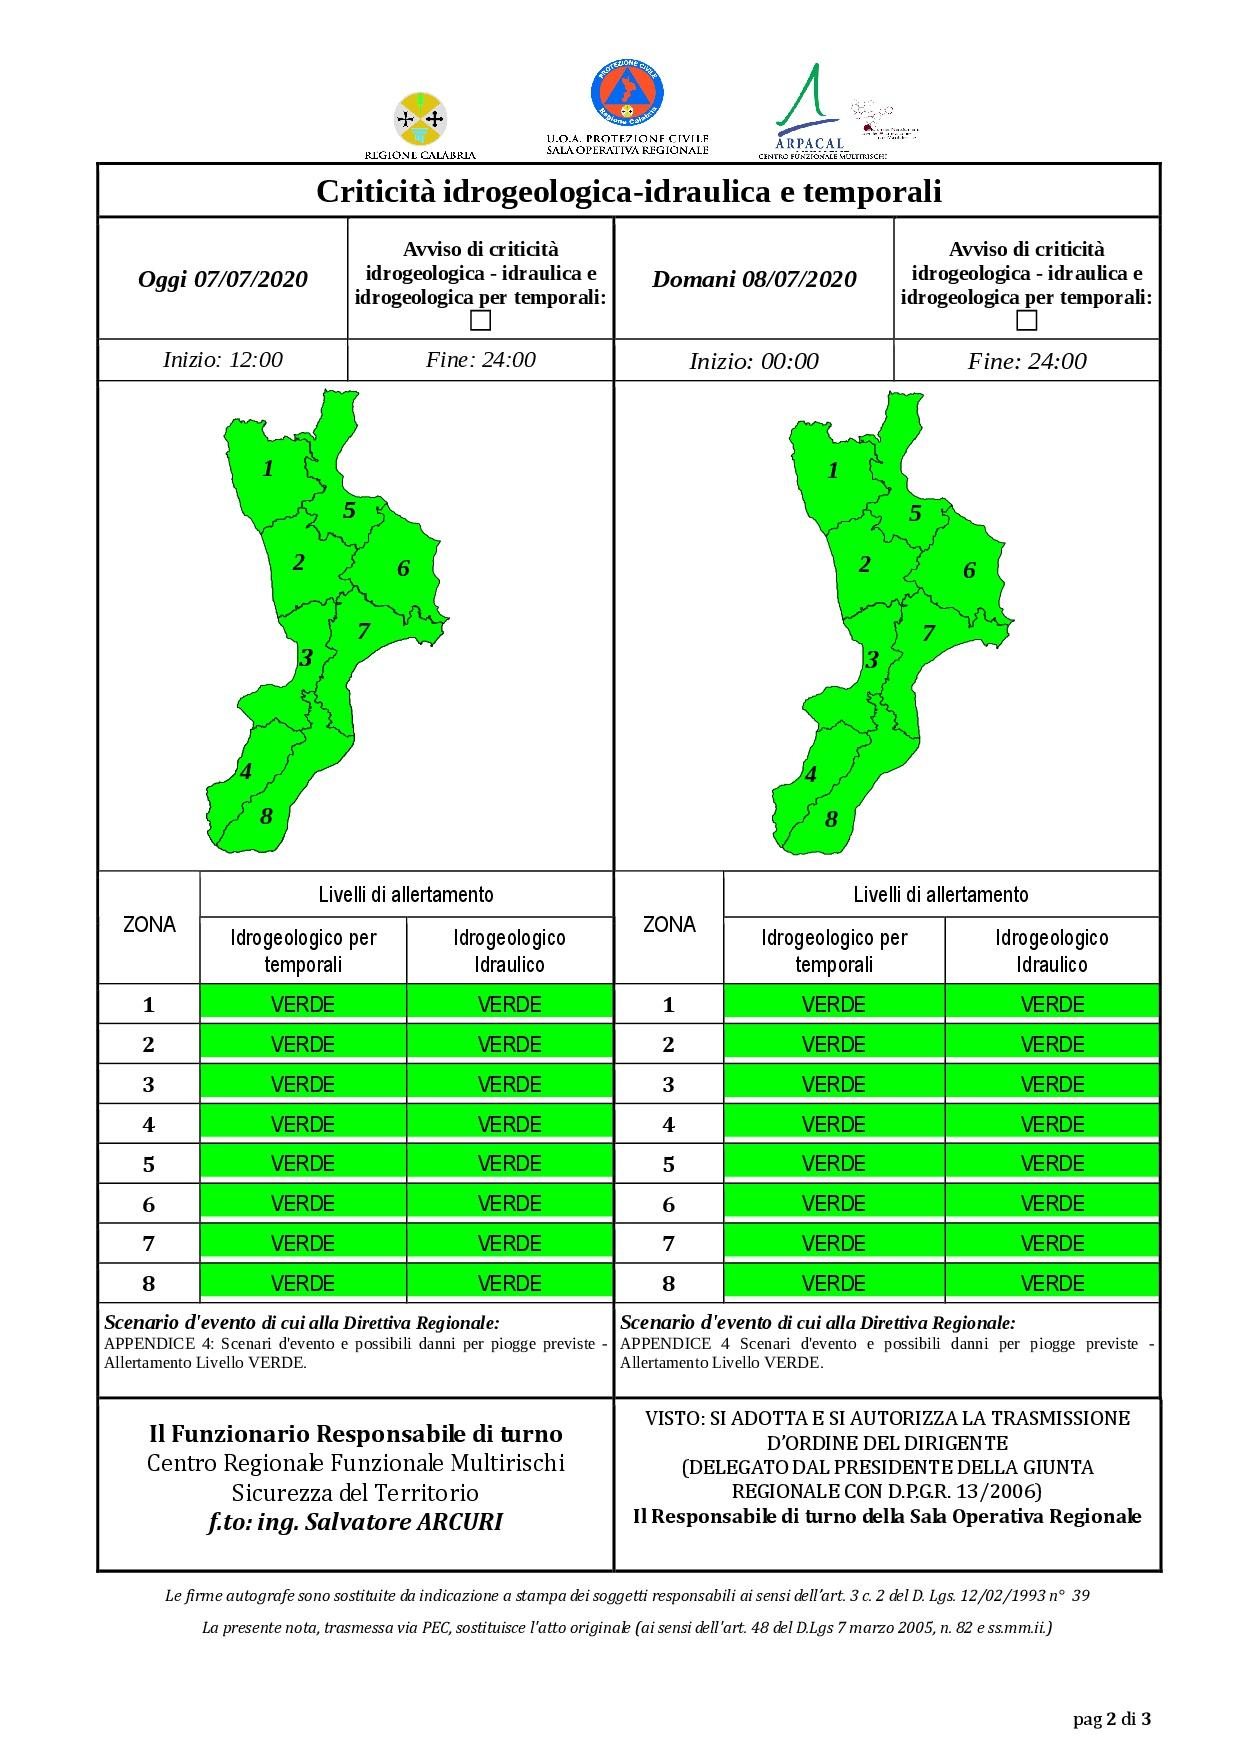 Criticità idrogeologica-idraulica e temporali in Calabria 07-07-2020